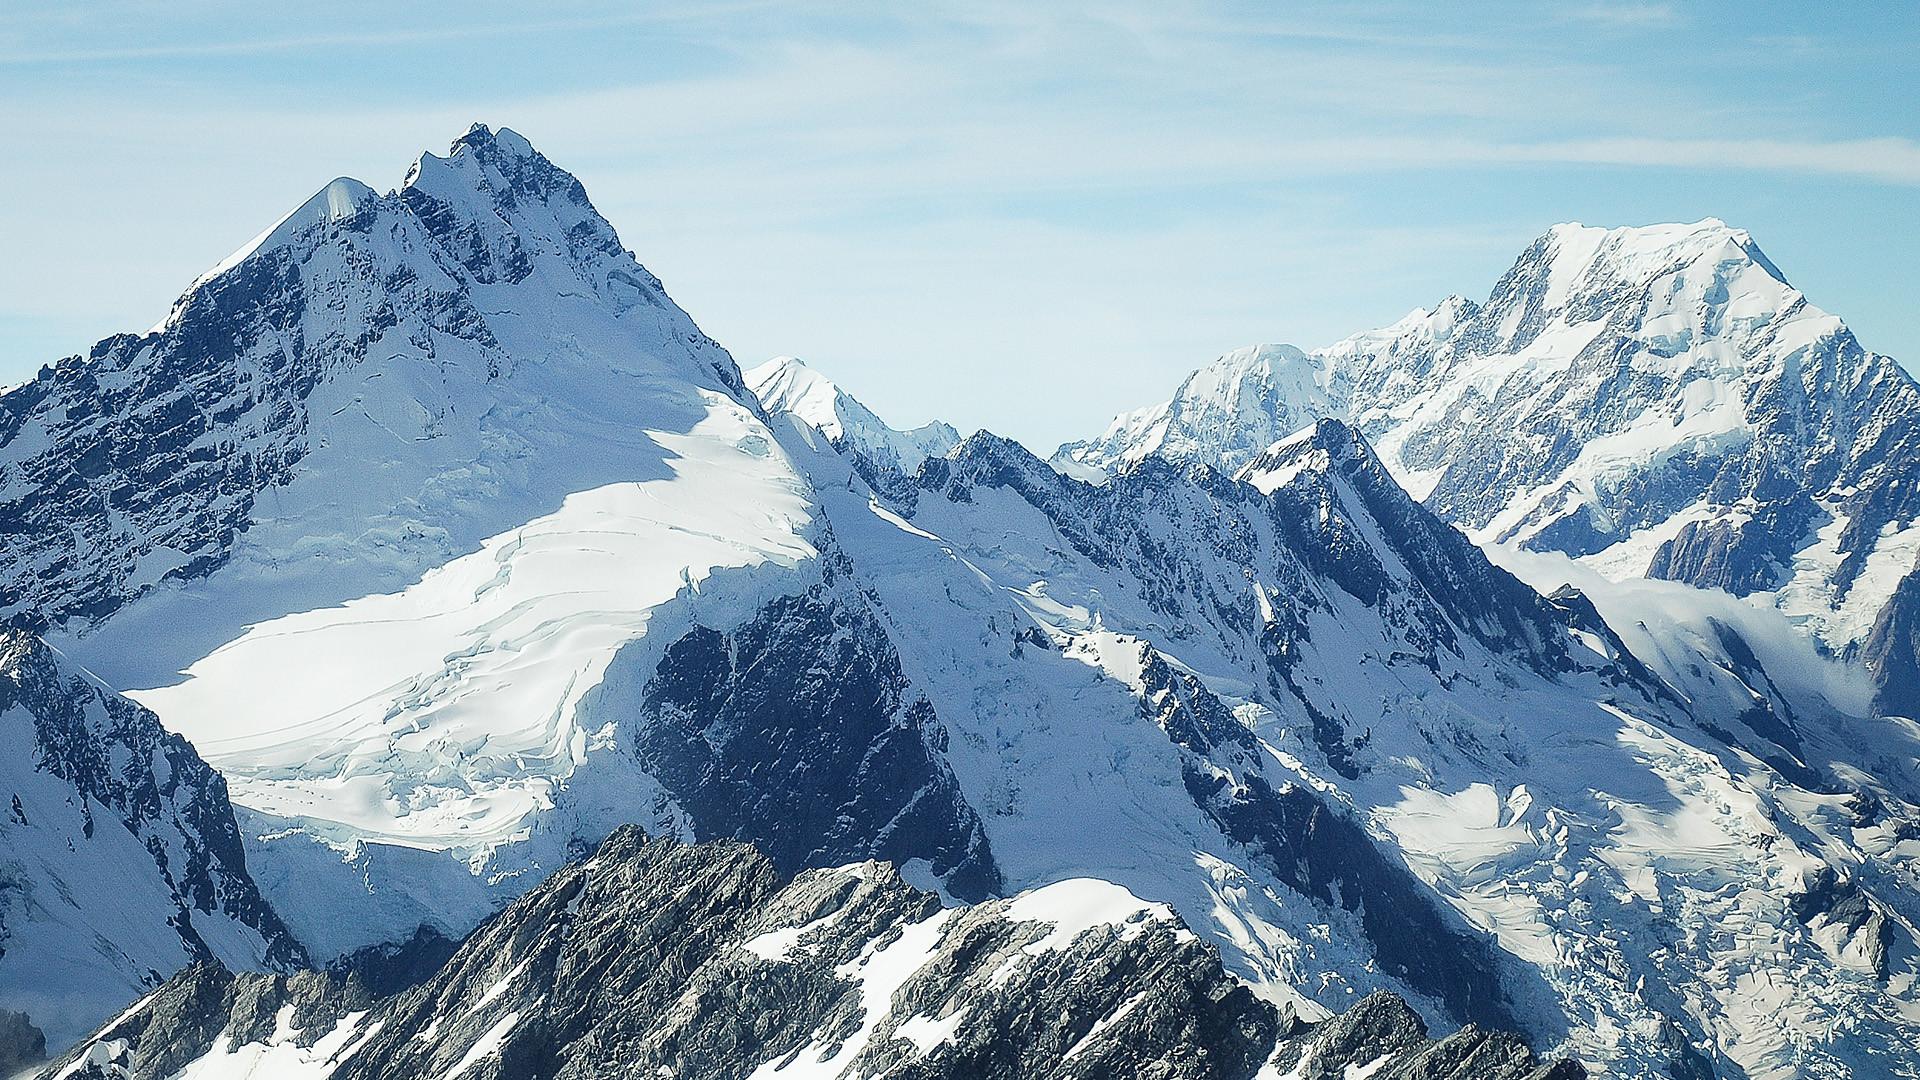 Winter Mountain HD Wallpaper